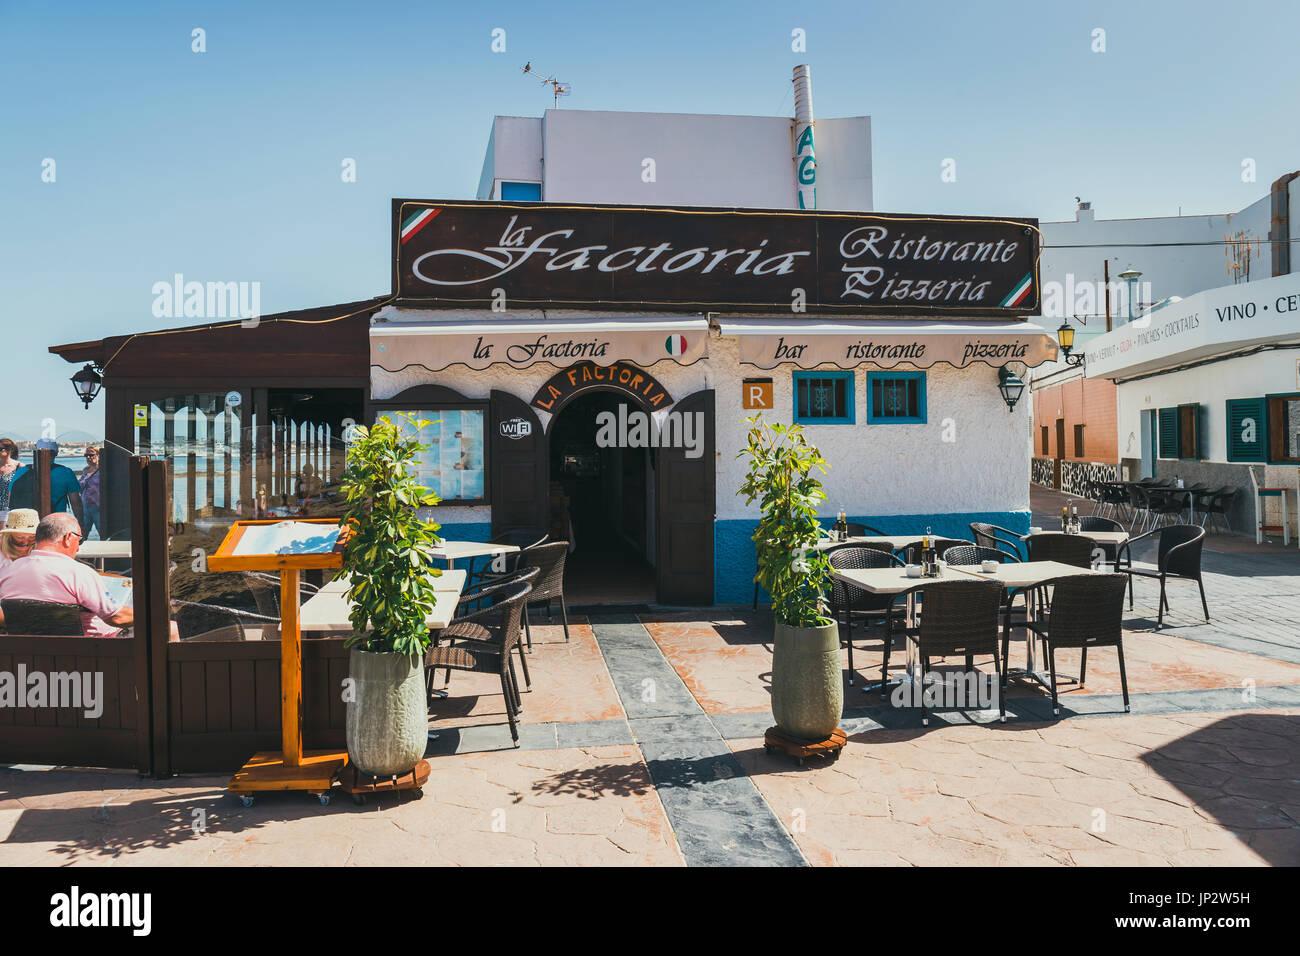 Fuerteventura Gay Club Spain In